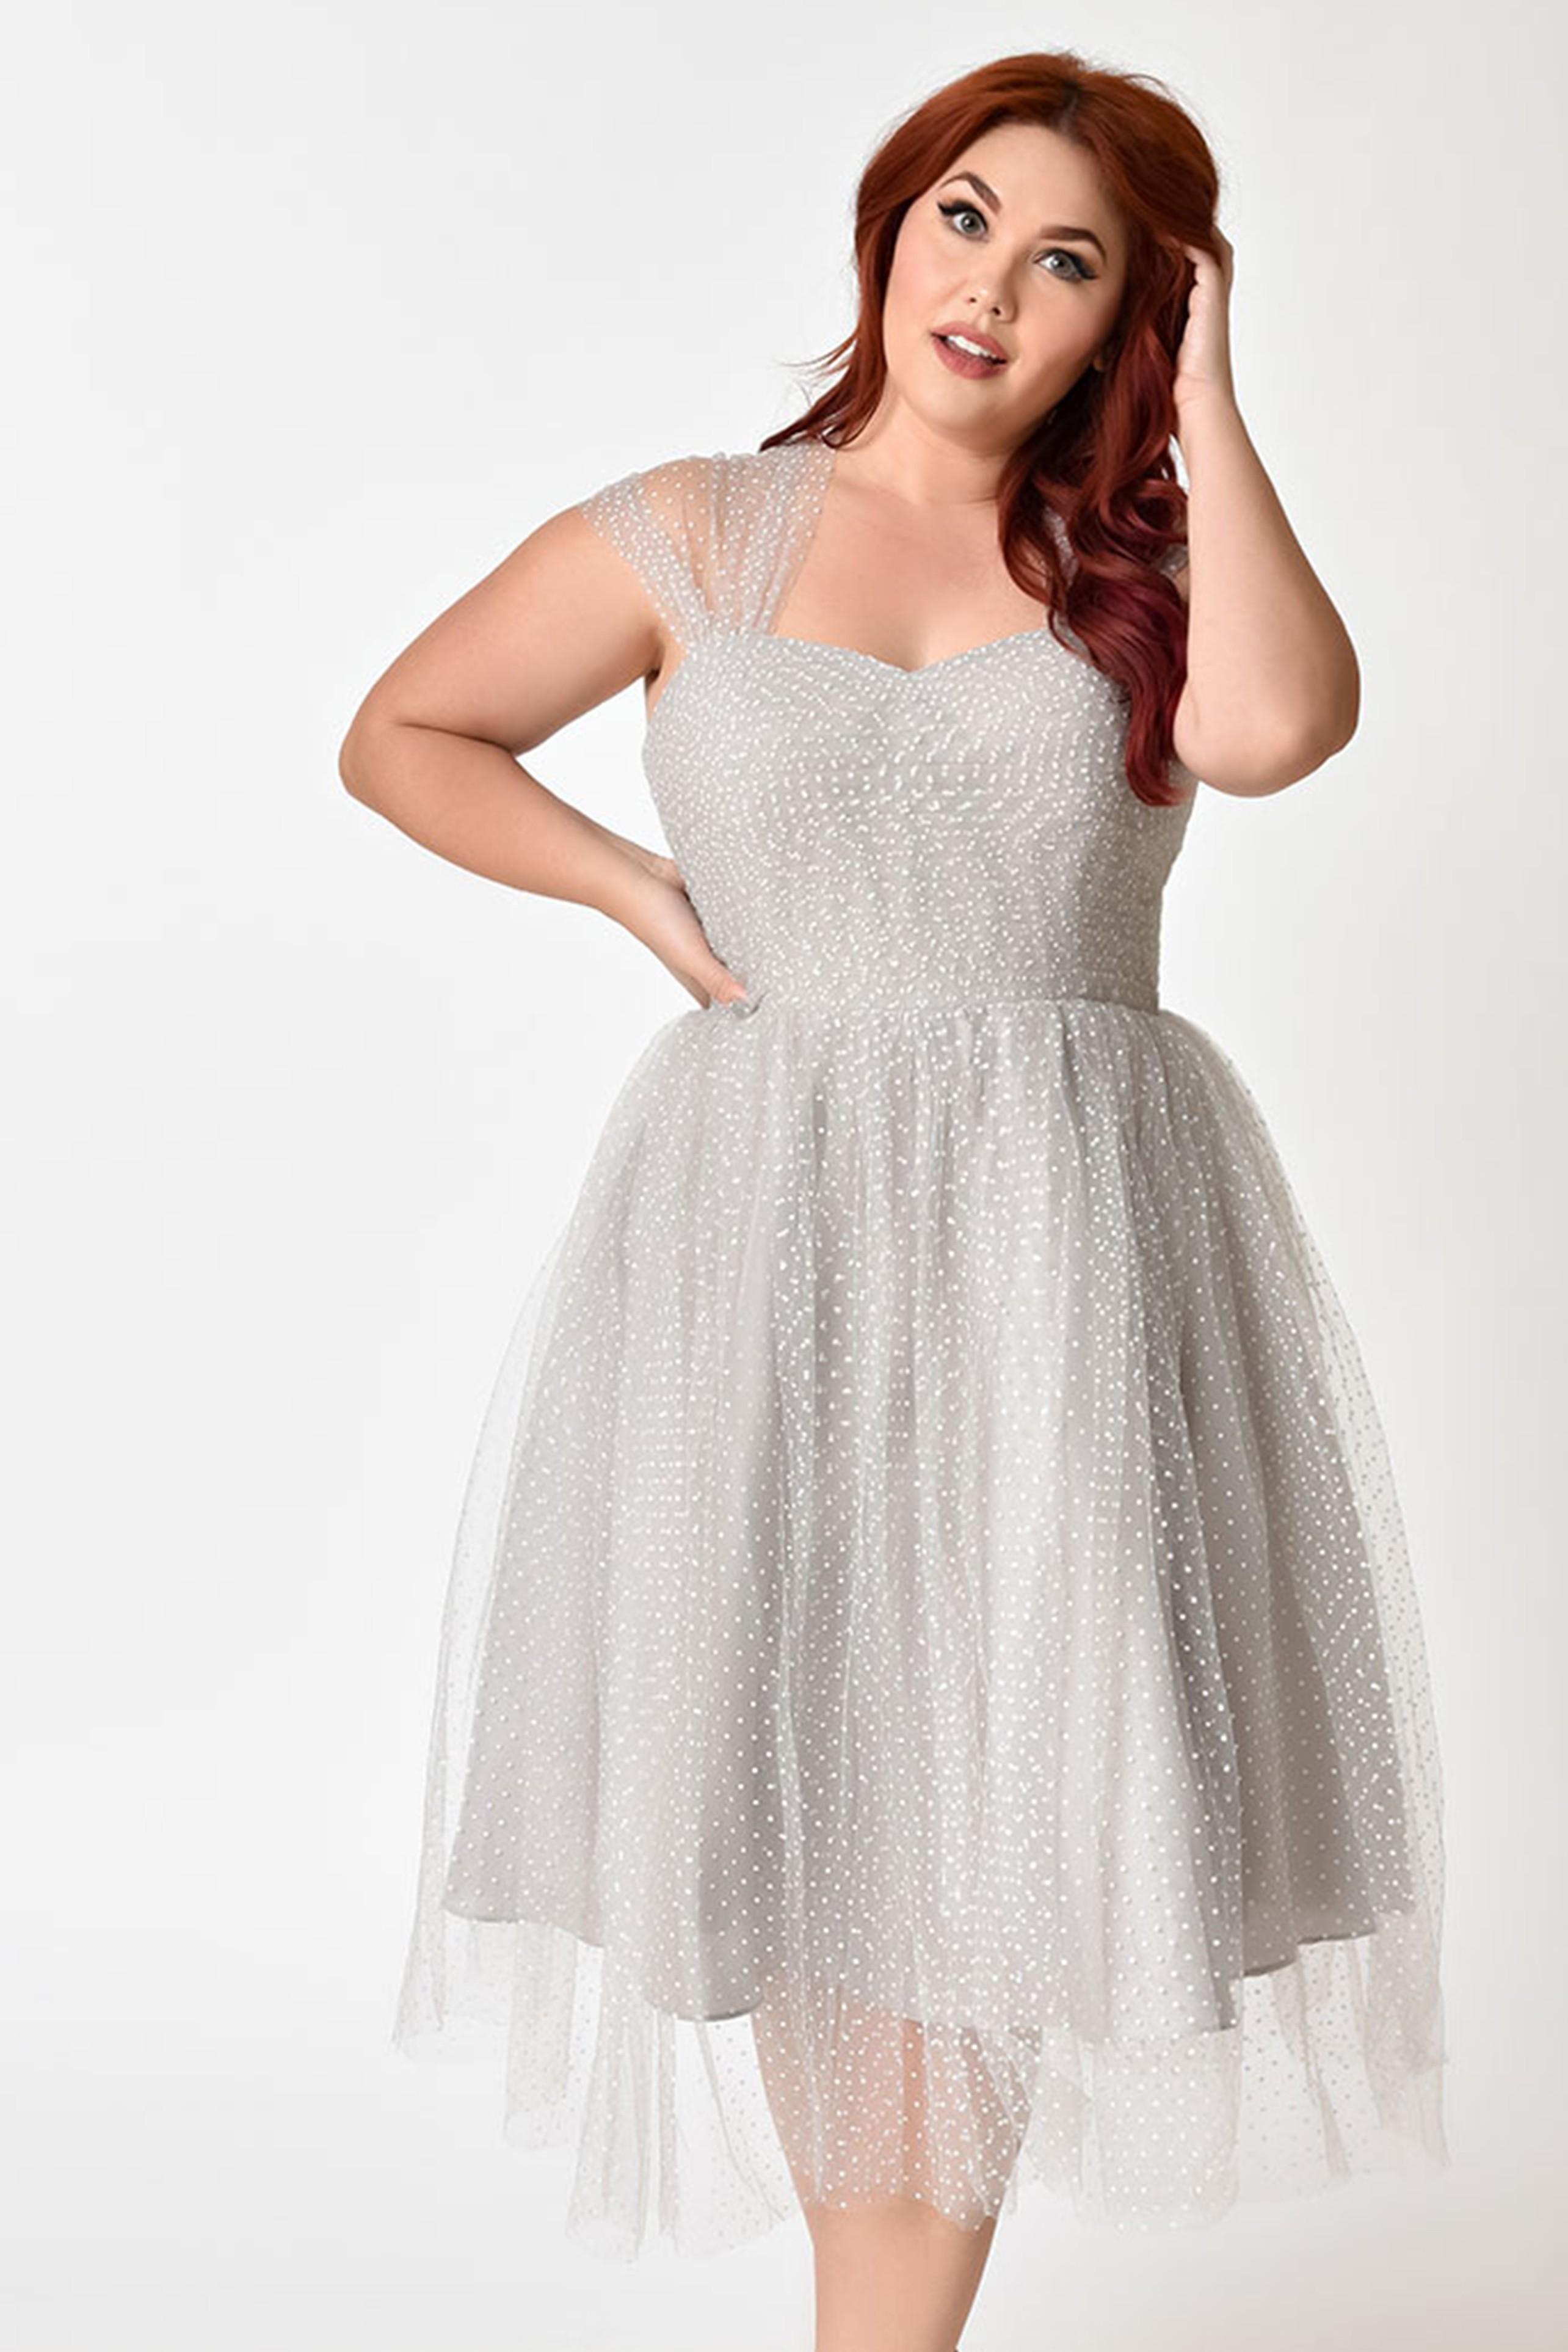 short-plus-size-vintage-cocktail-dresses-blonde-pussy-peeing